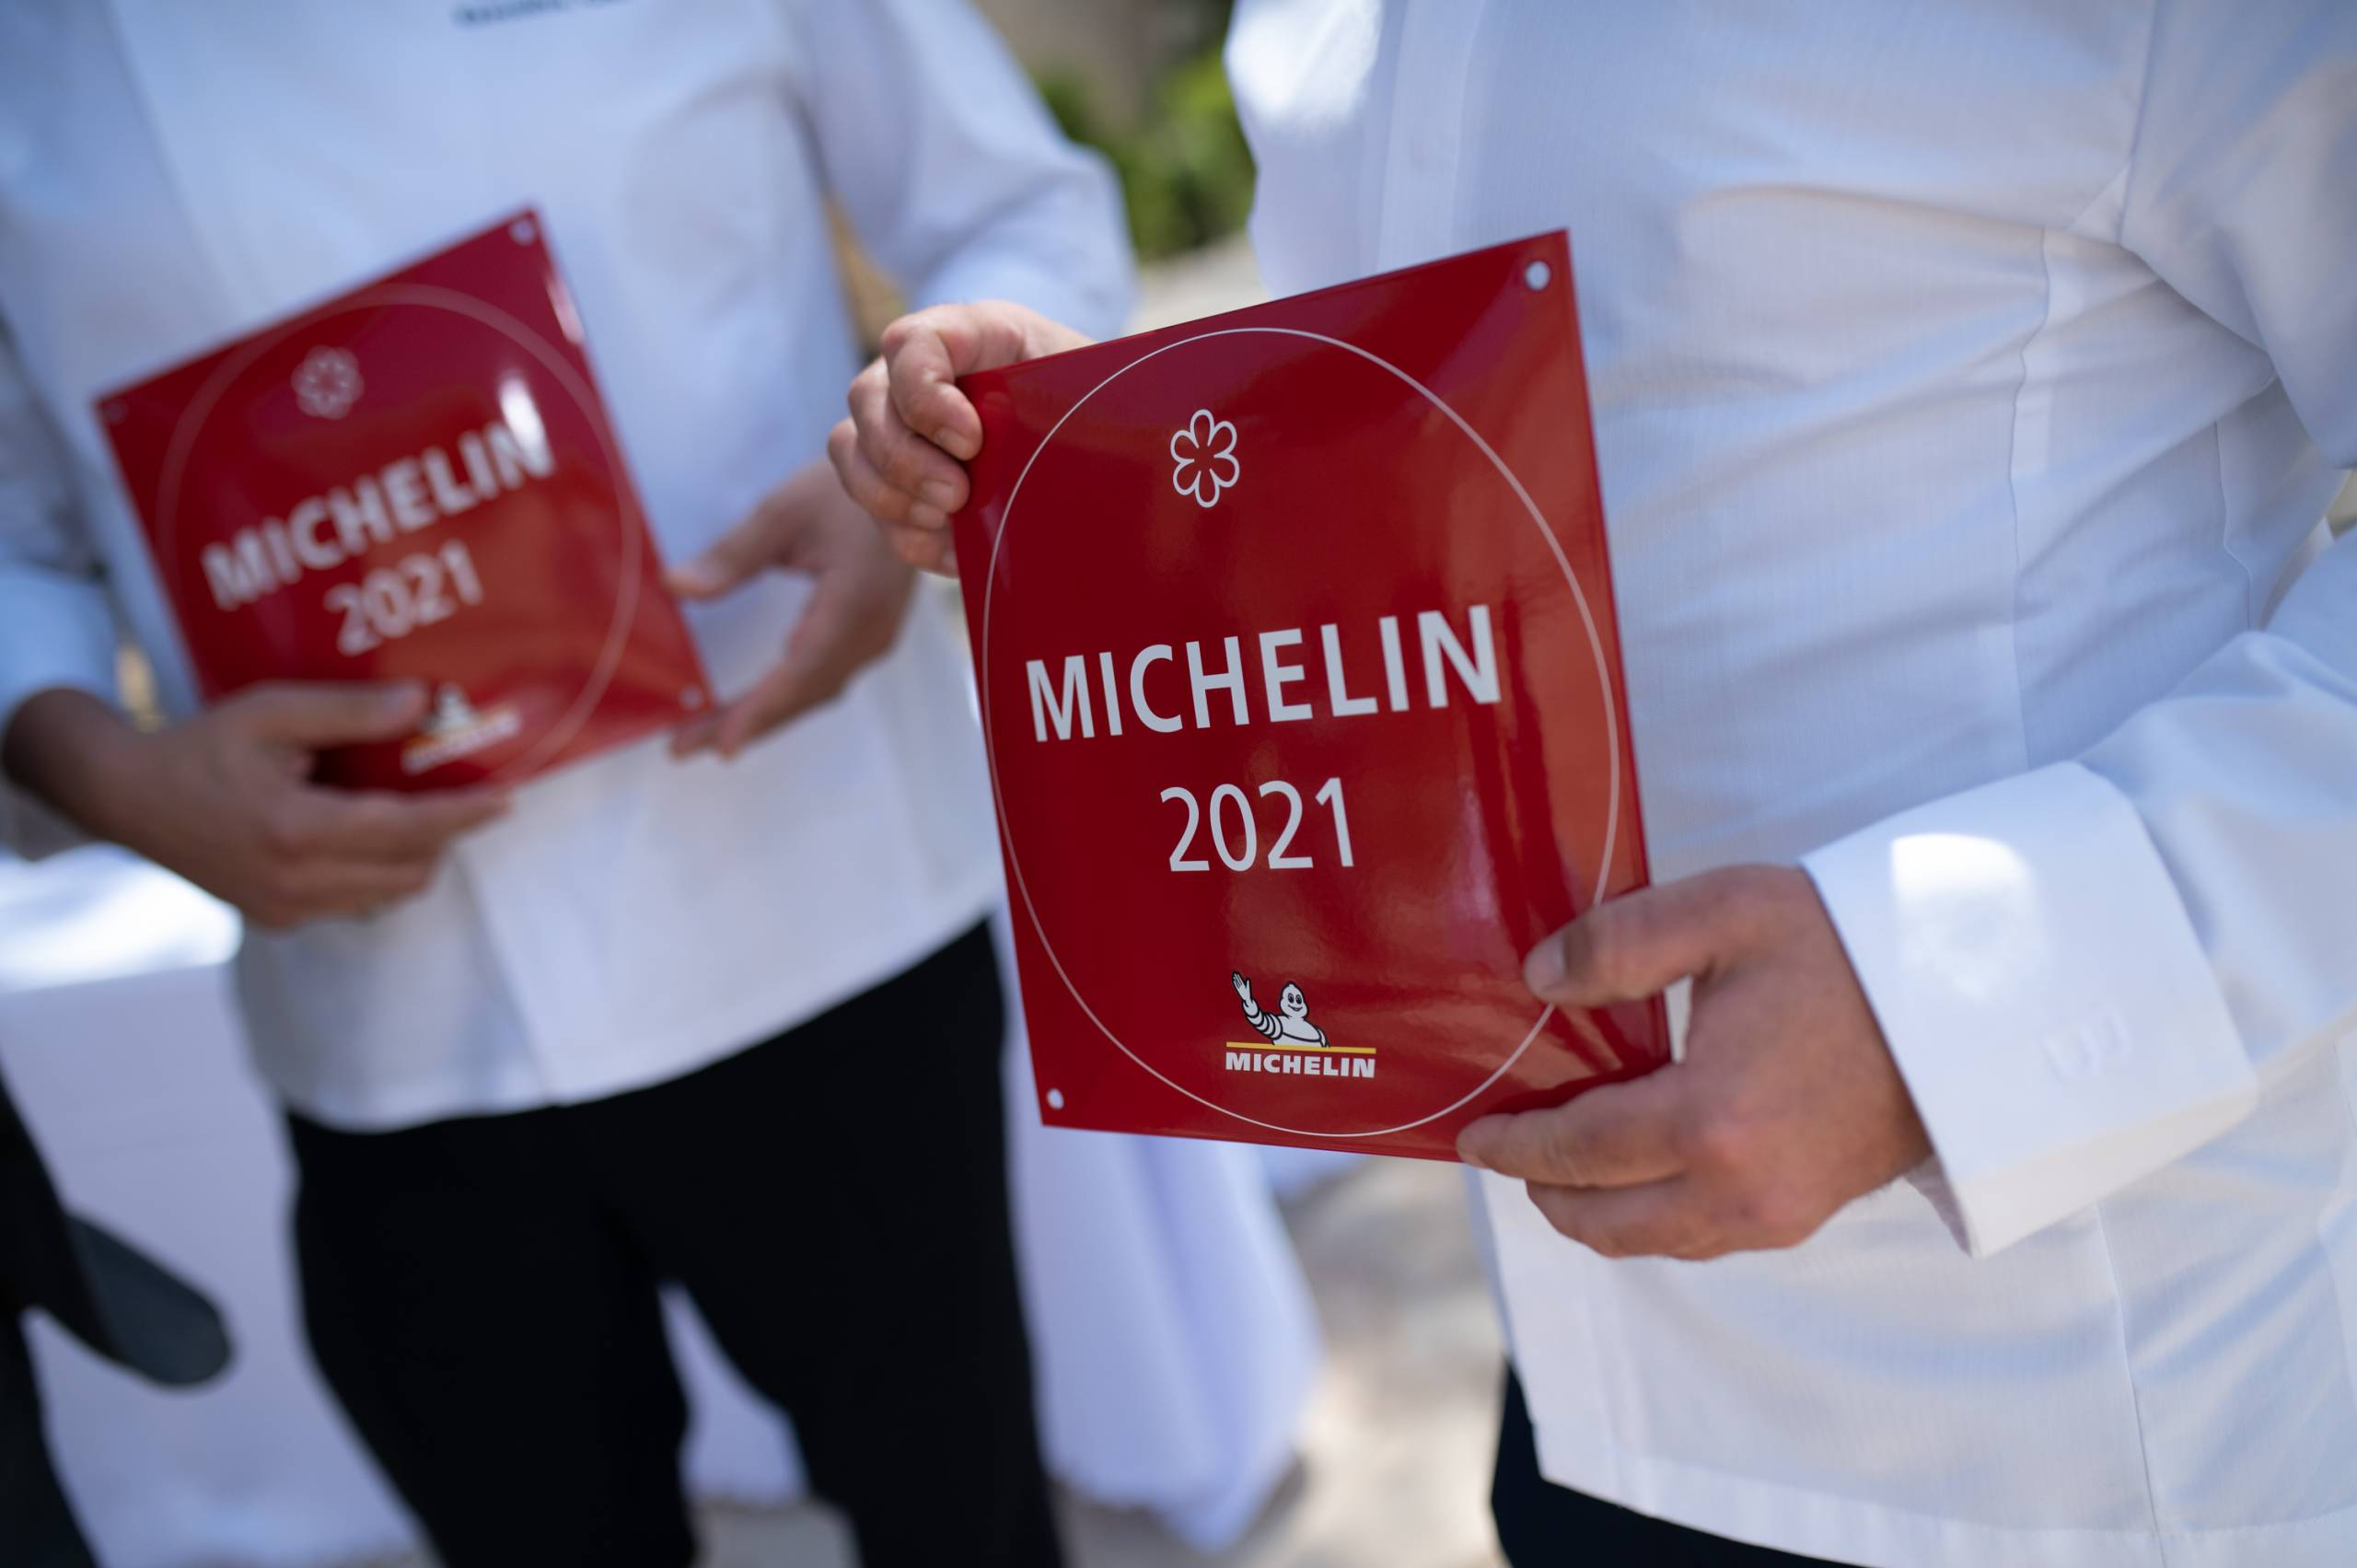 FIVE new restaurants added on Michelin Guide Malta 2021